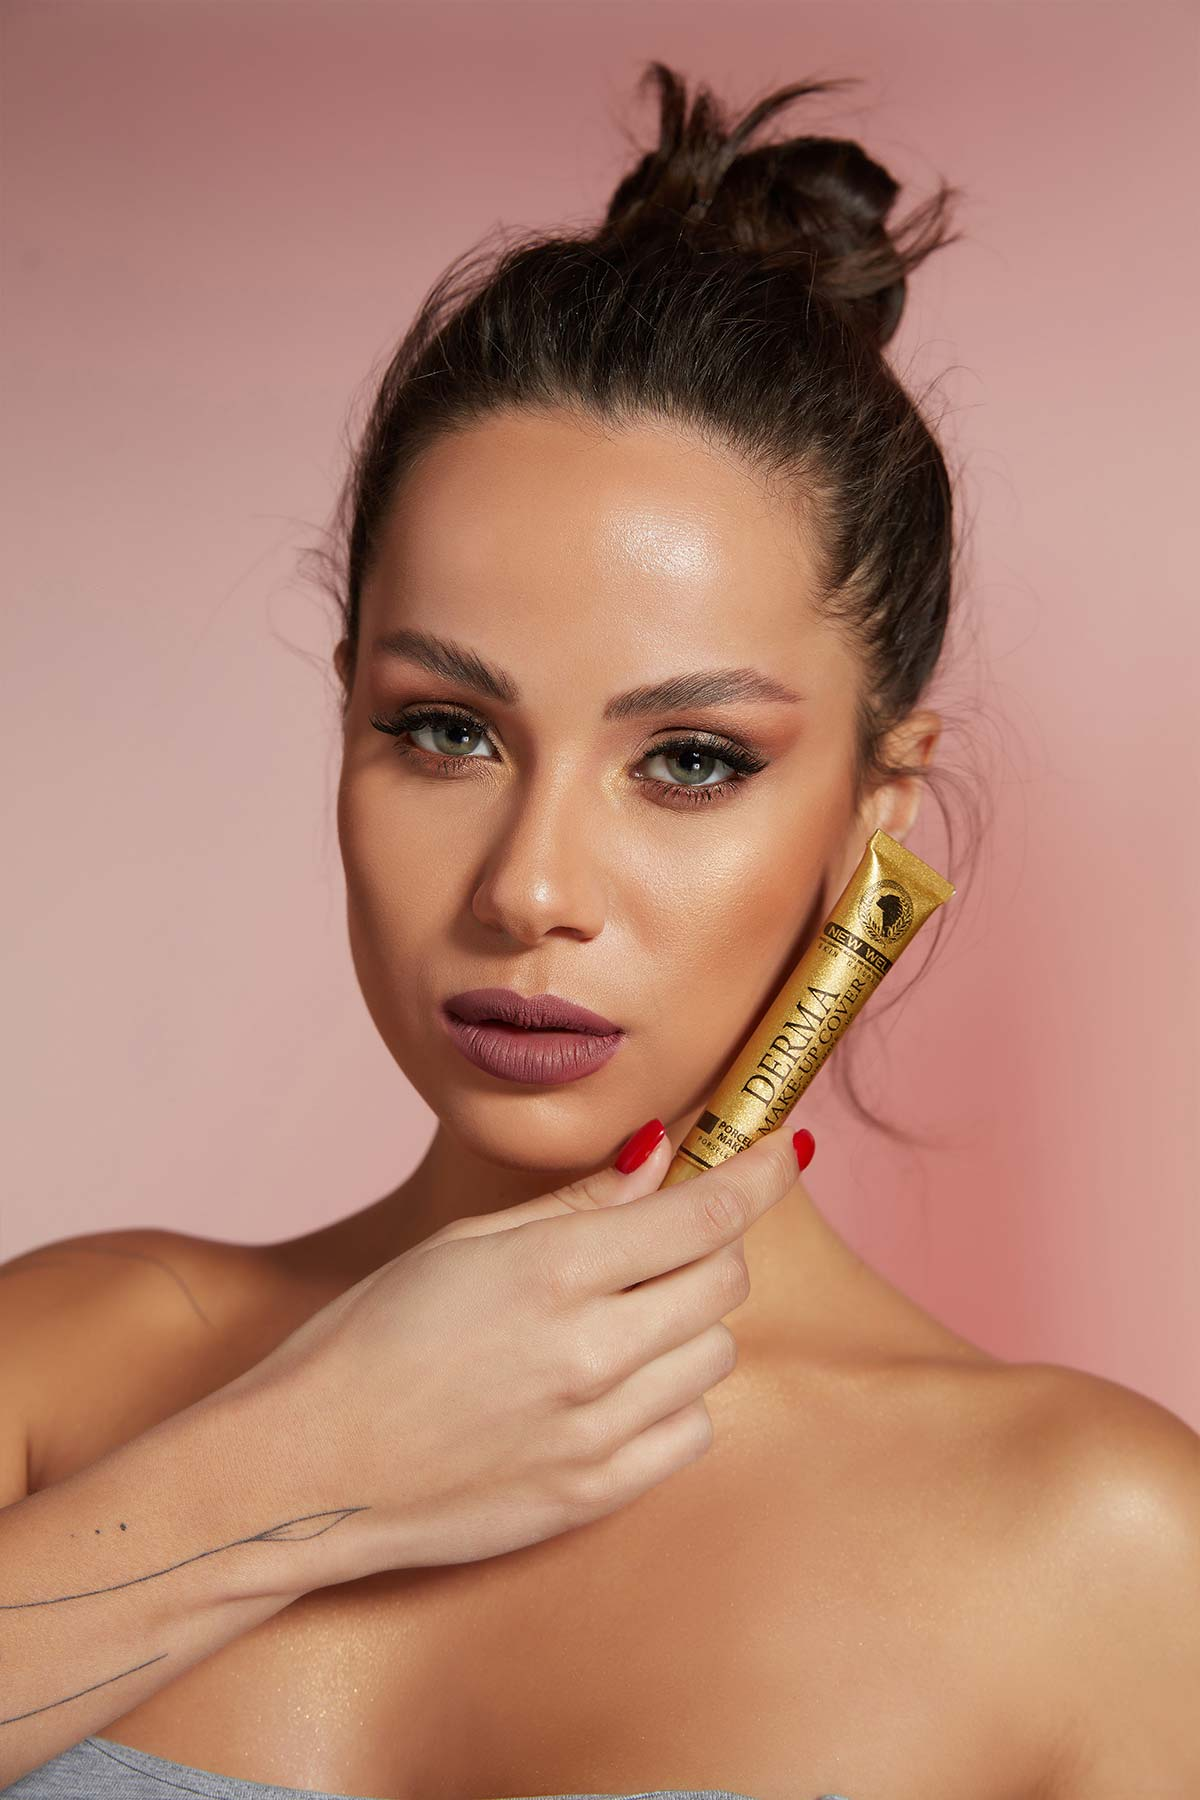 Derma Make-Up Cover Foundation - Platinium -Fondöten - Foundation Thumbnail